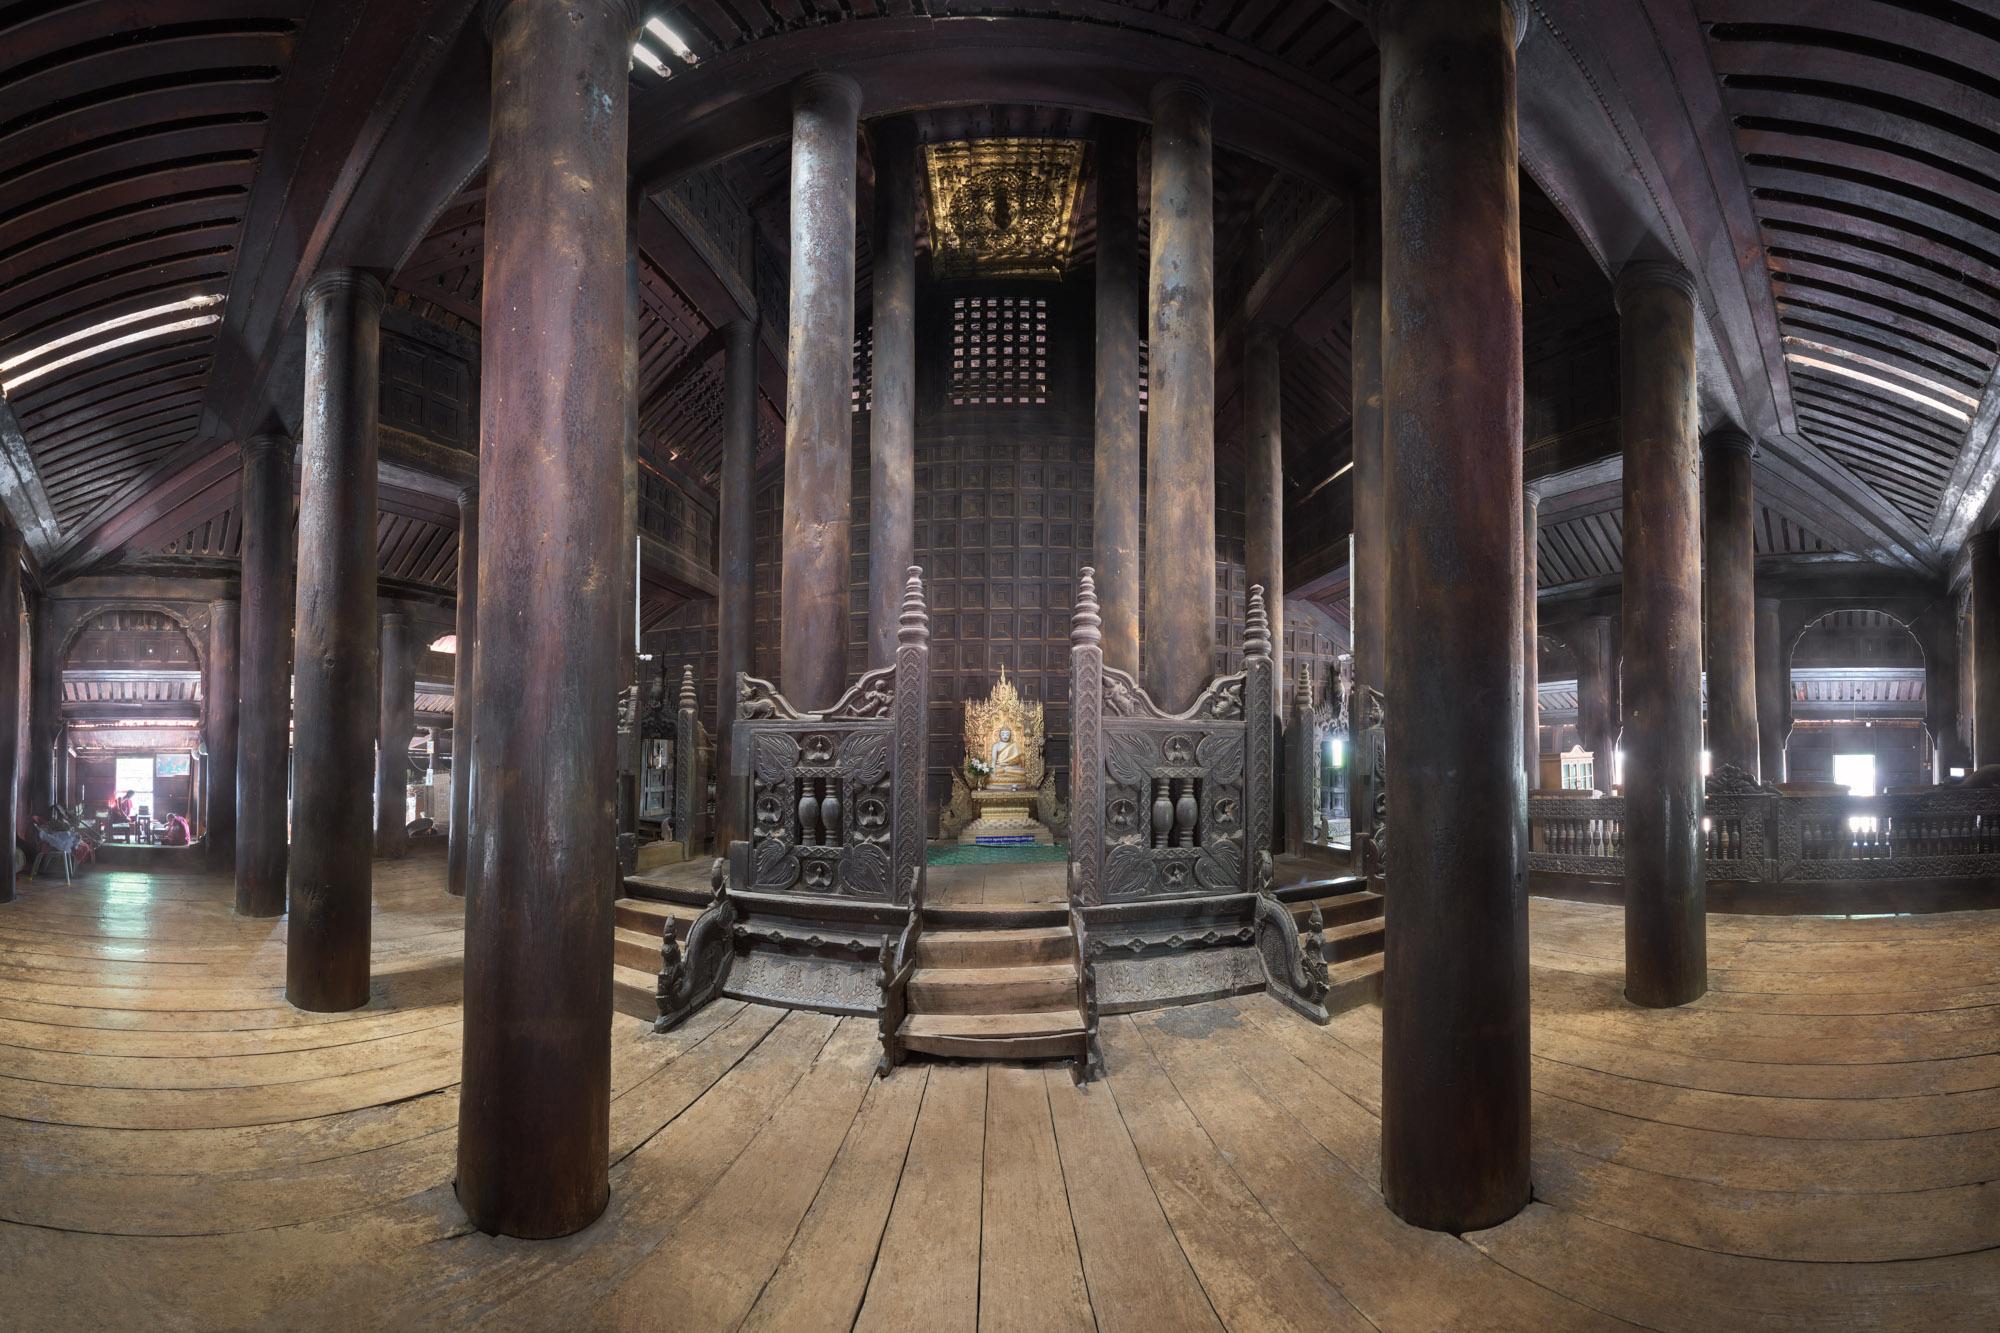 Interior of Bagaya Monastery, Inwa, Myanmar